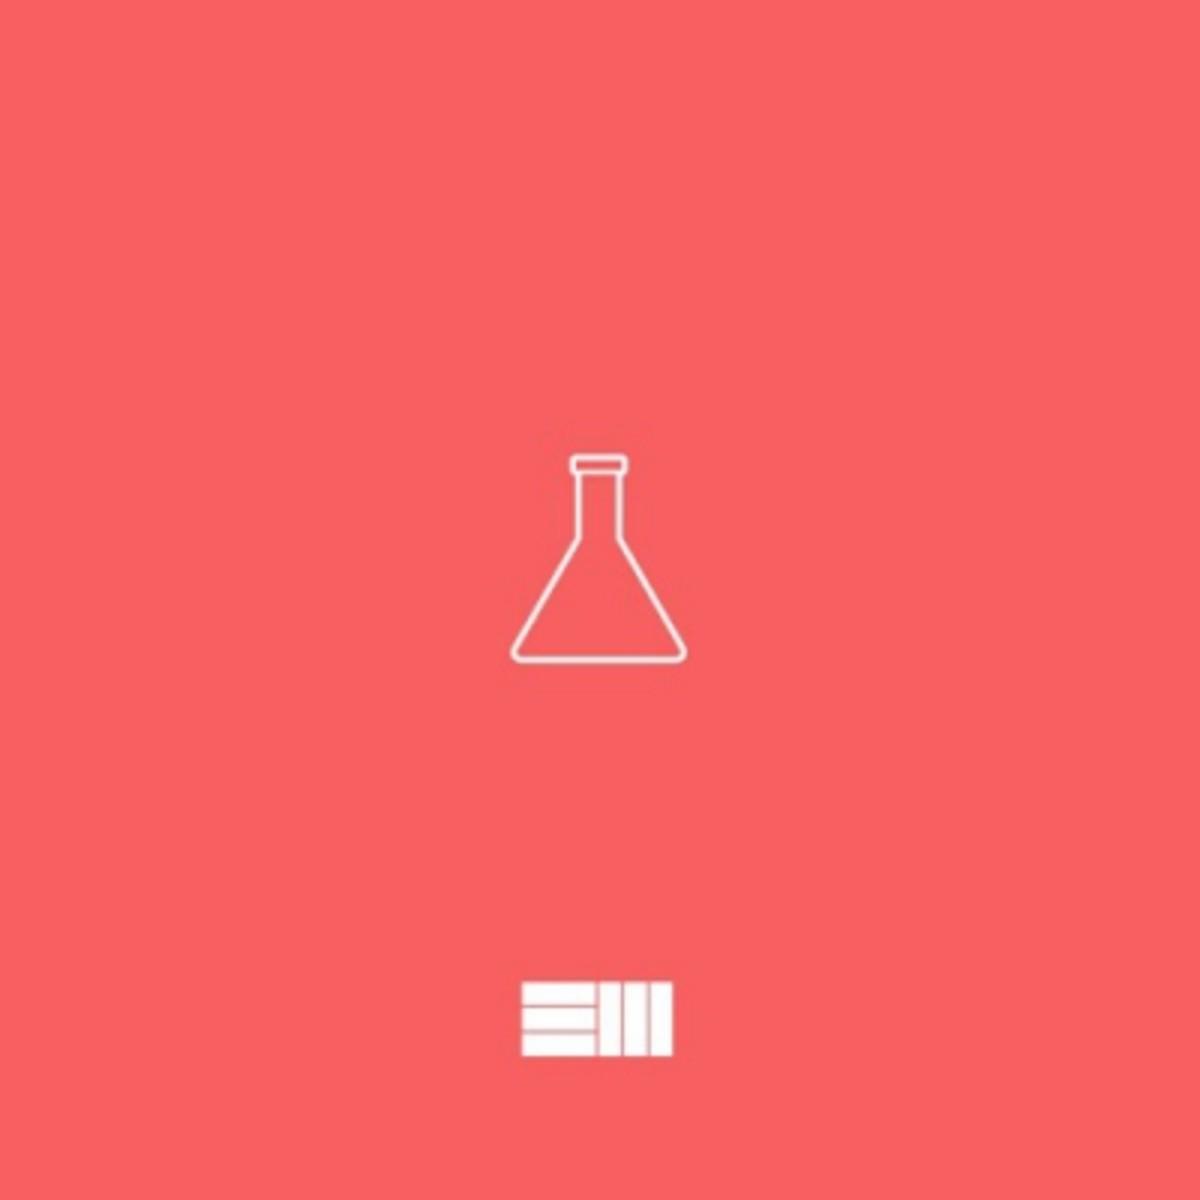 russ-the-formula.jpg